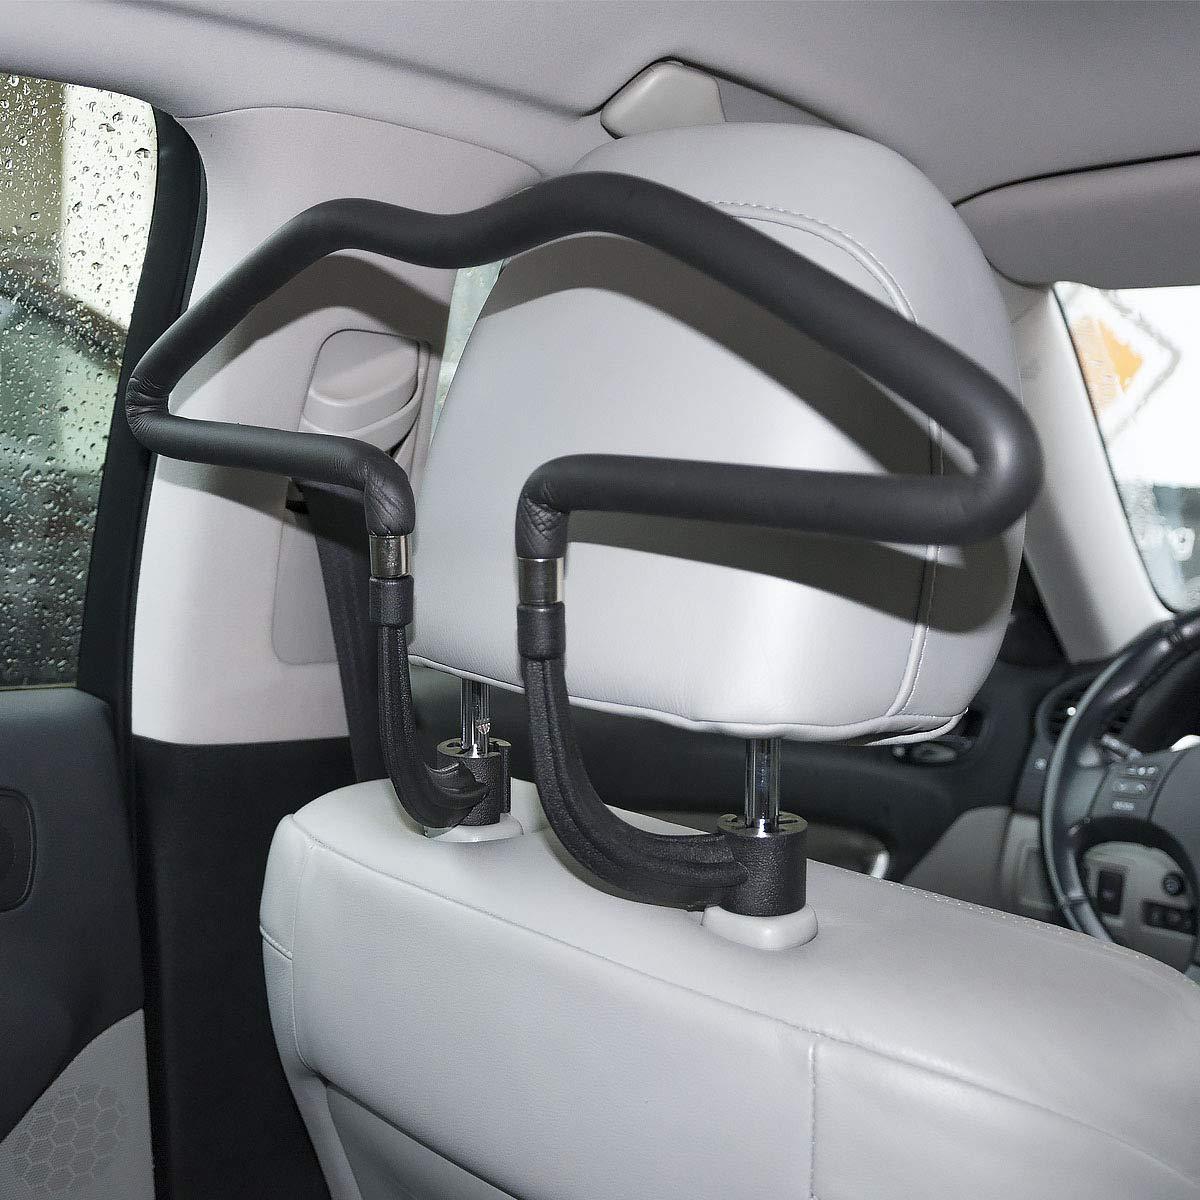 Jacken M/äntel usw. MidGard Autositz Kleiderb/ügel universal Kopfst/ützen Autositz Autokleiderb/ügel f/ür Anz/üge